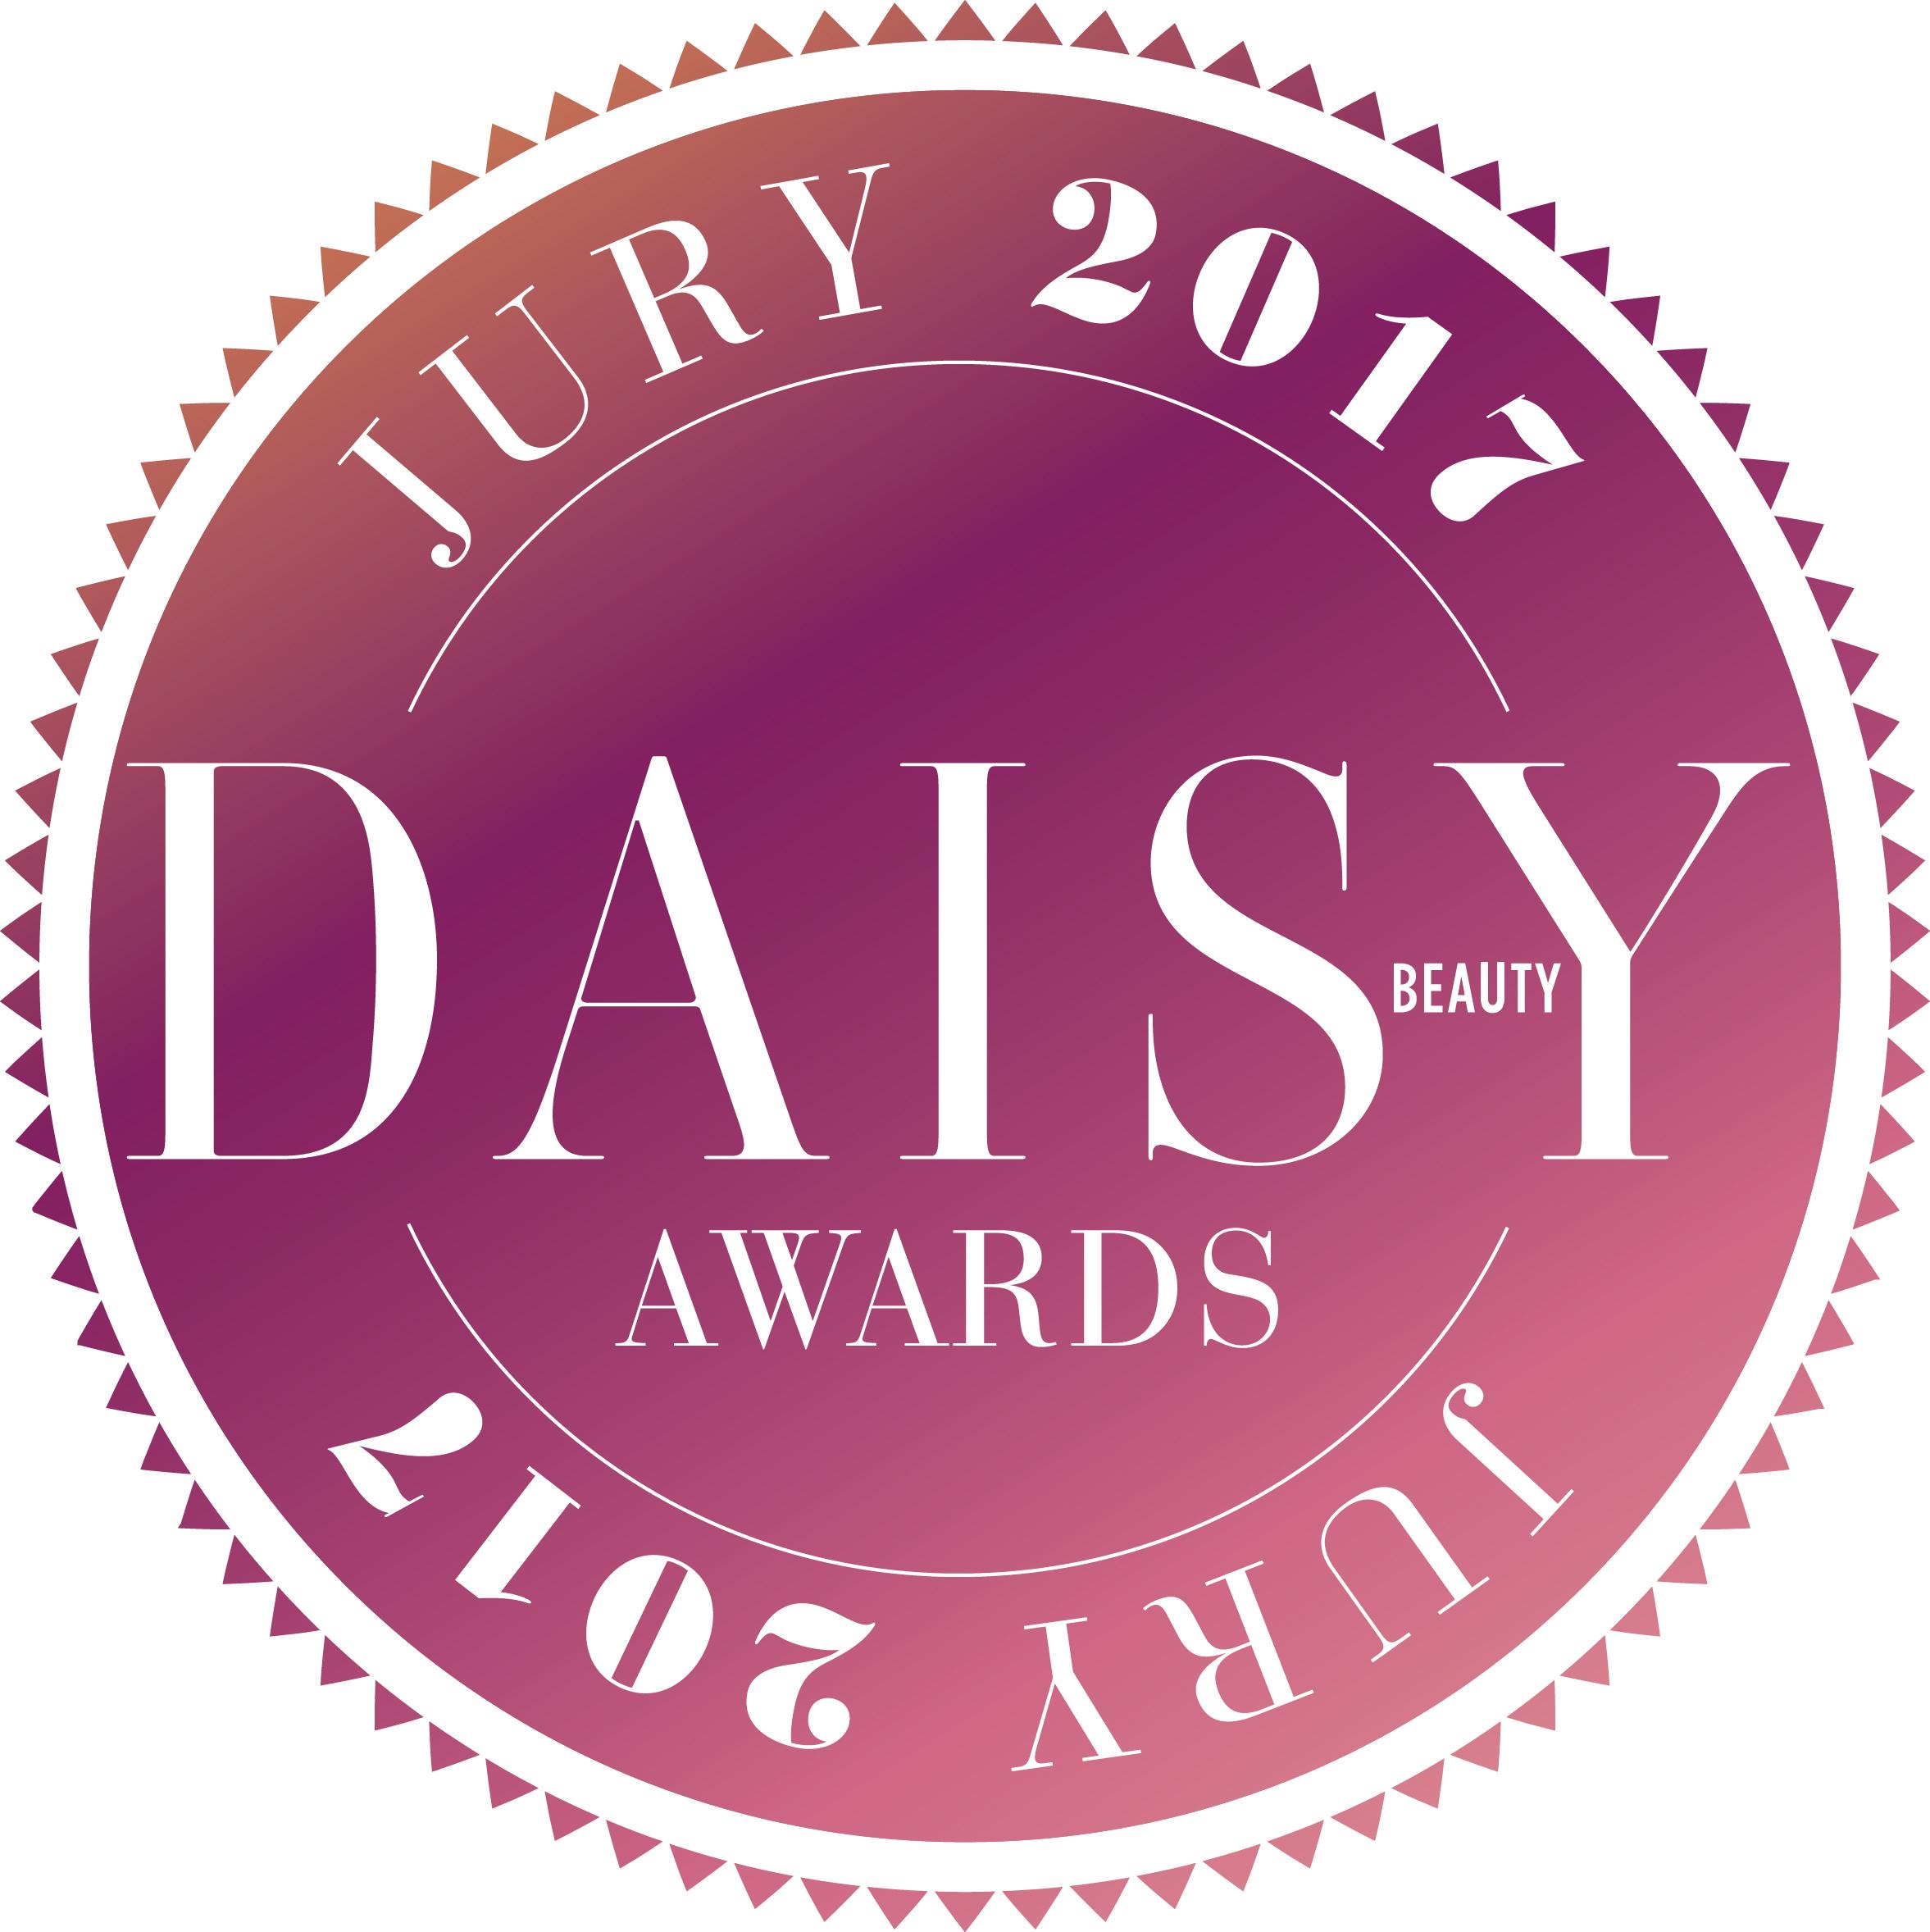 Agneta Elmegård är jurymedlem i Daisy Beautys parfympanel